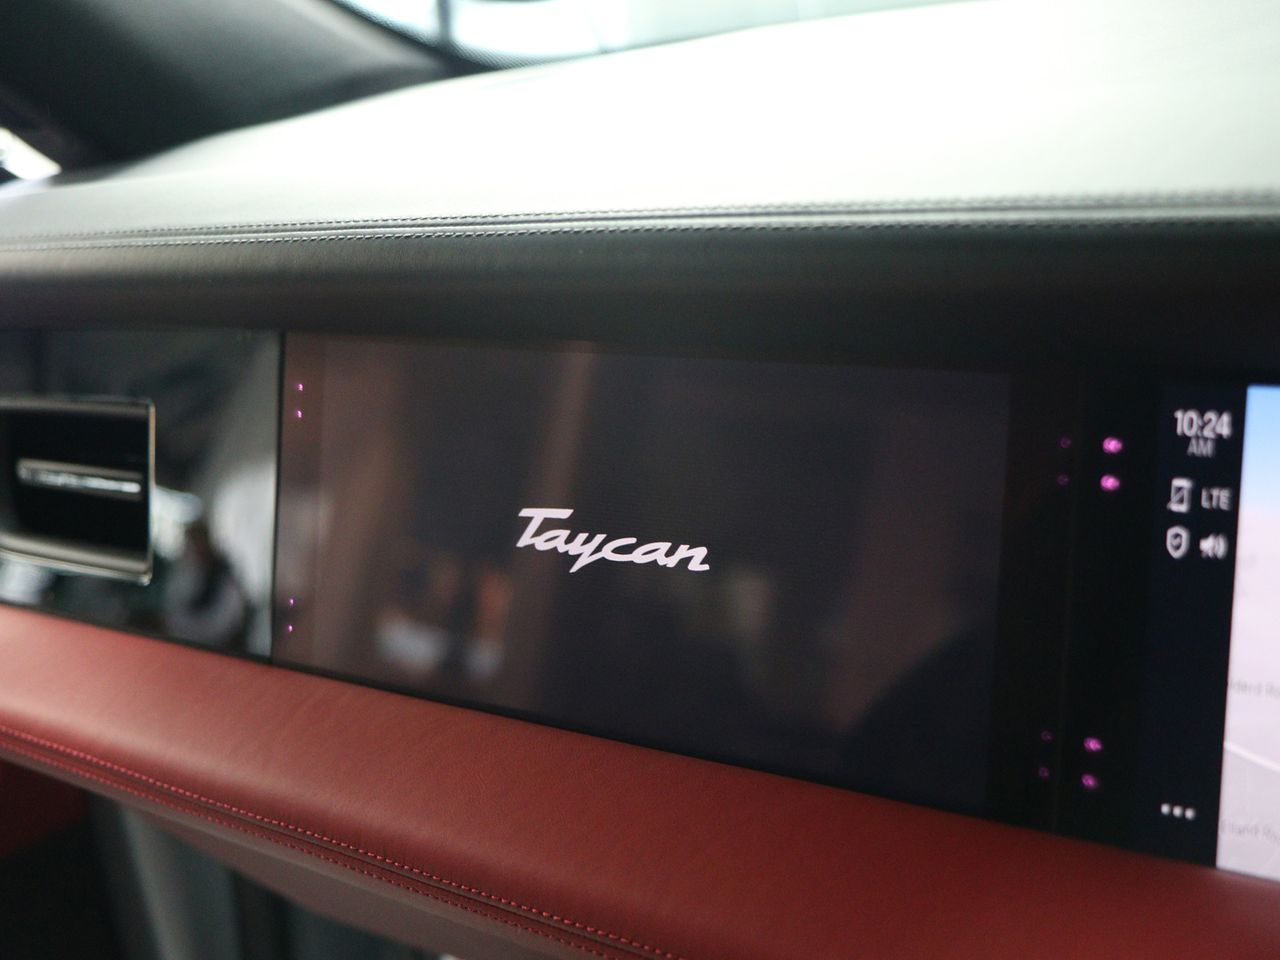 Taycan 4S (93KWH) (4) image 18